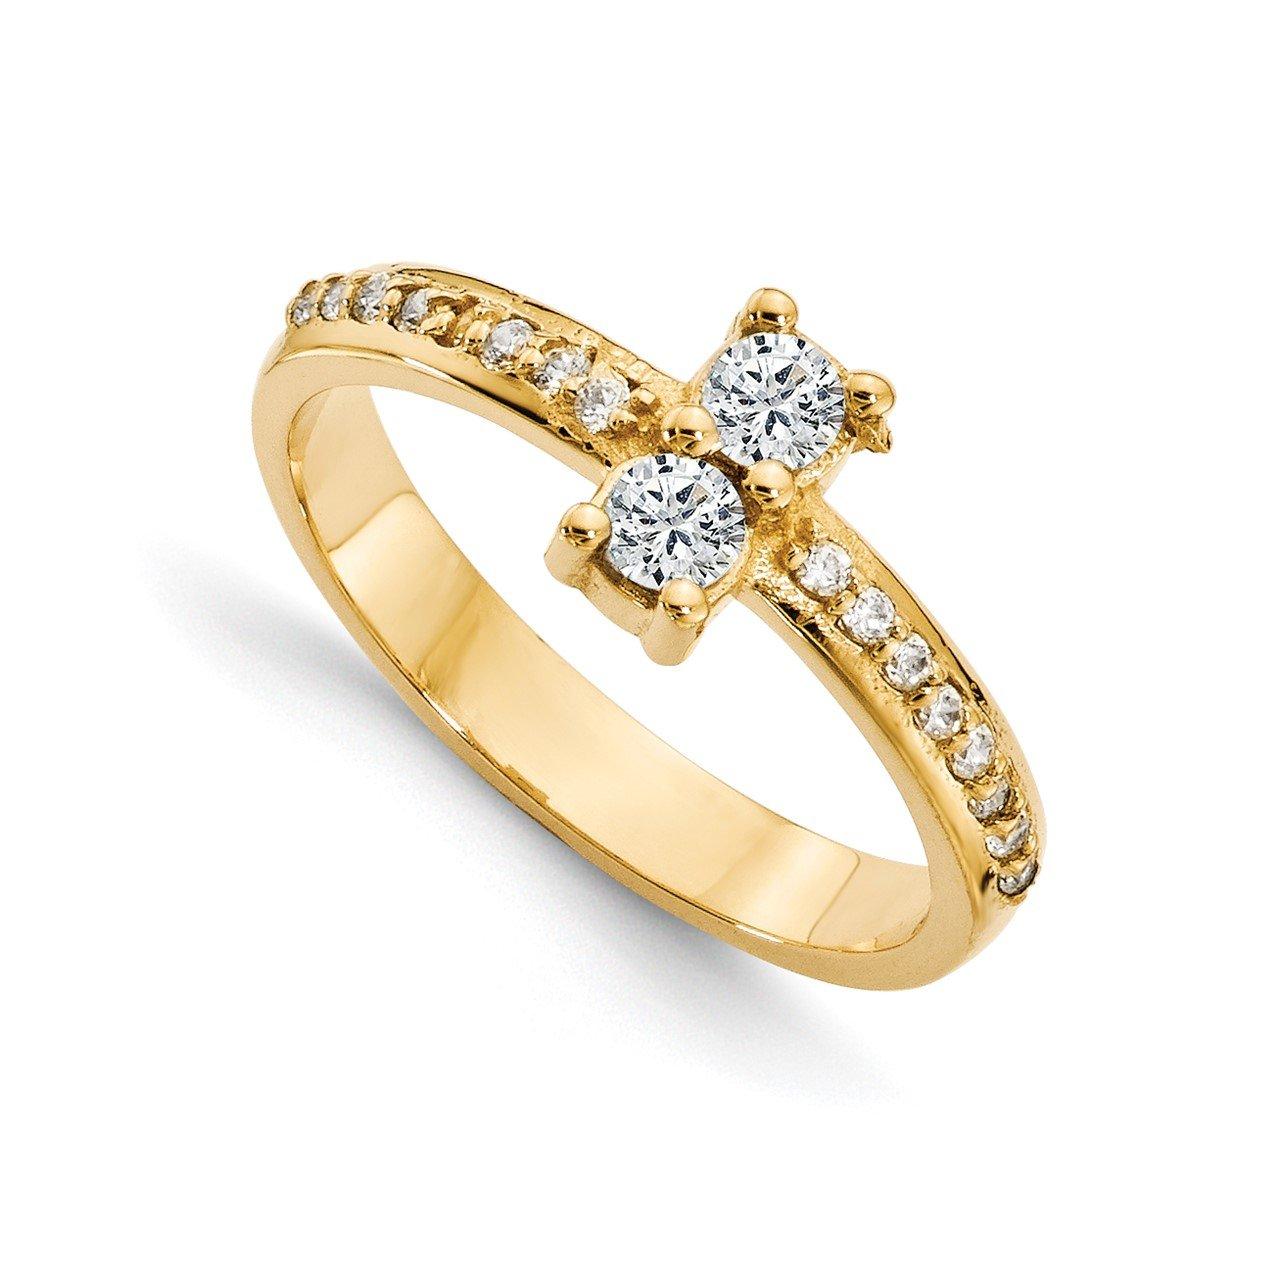 14ky A Diamond 2-stone Ring Semi-Mount - 2.7 mm center stones